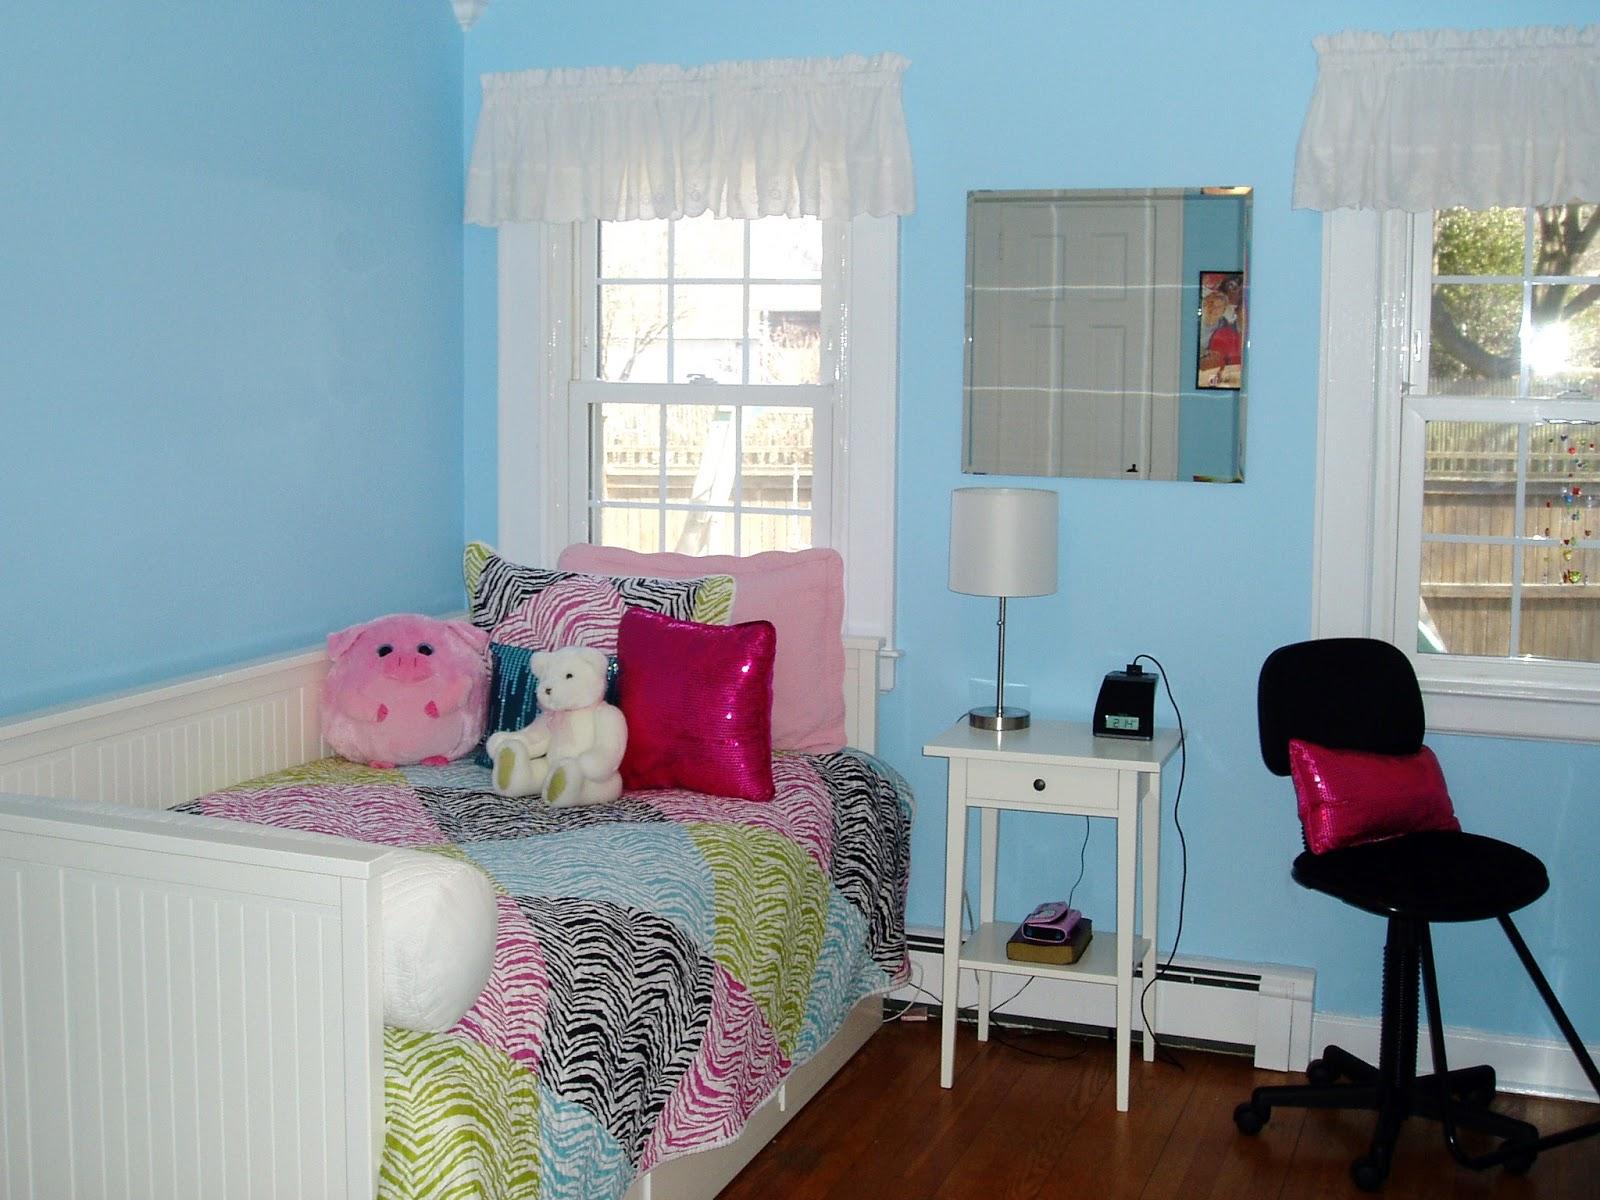 Blue bedroom with rainbow zebra quilt